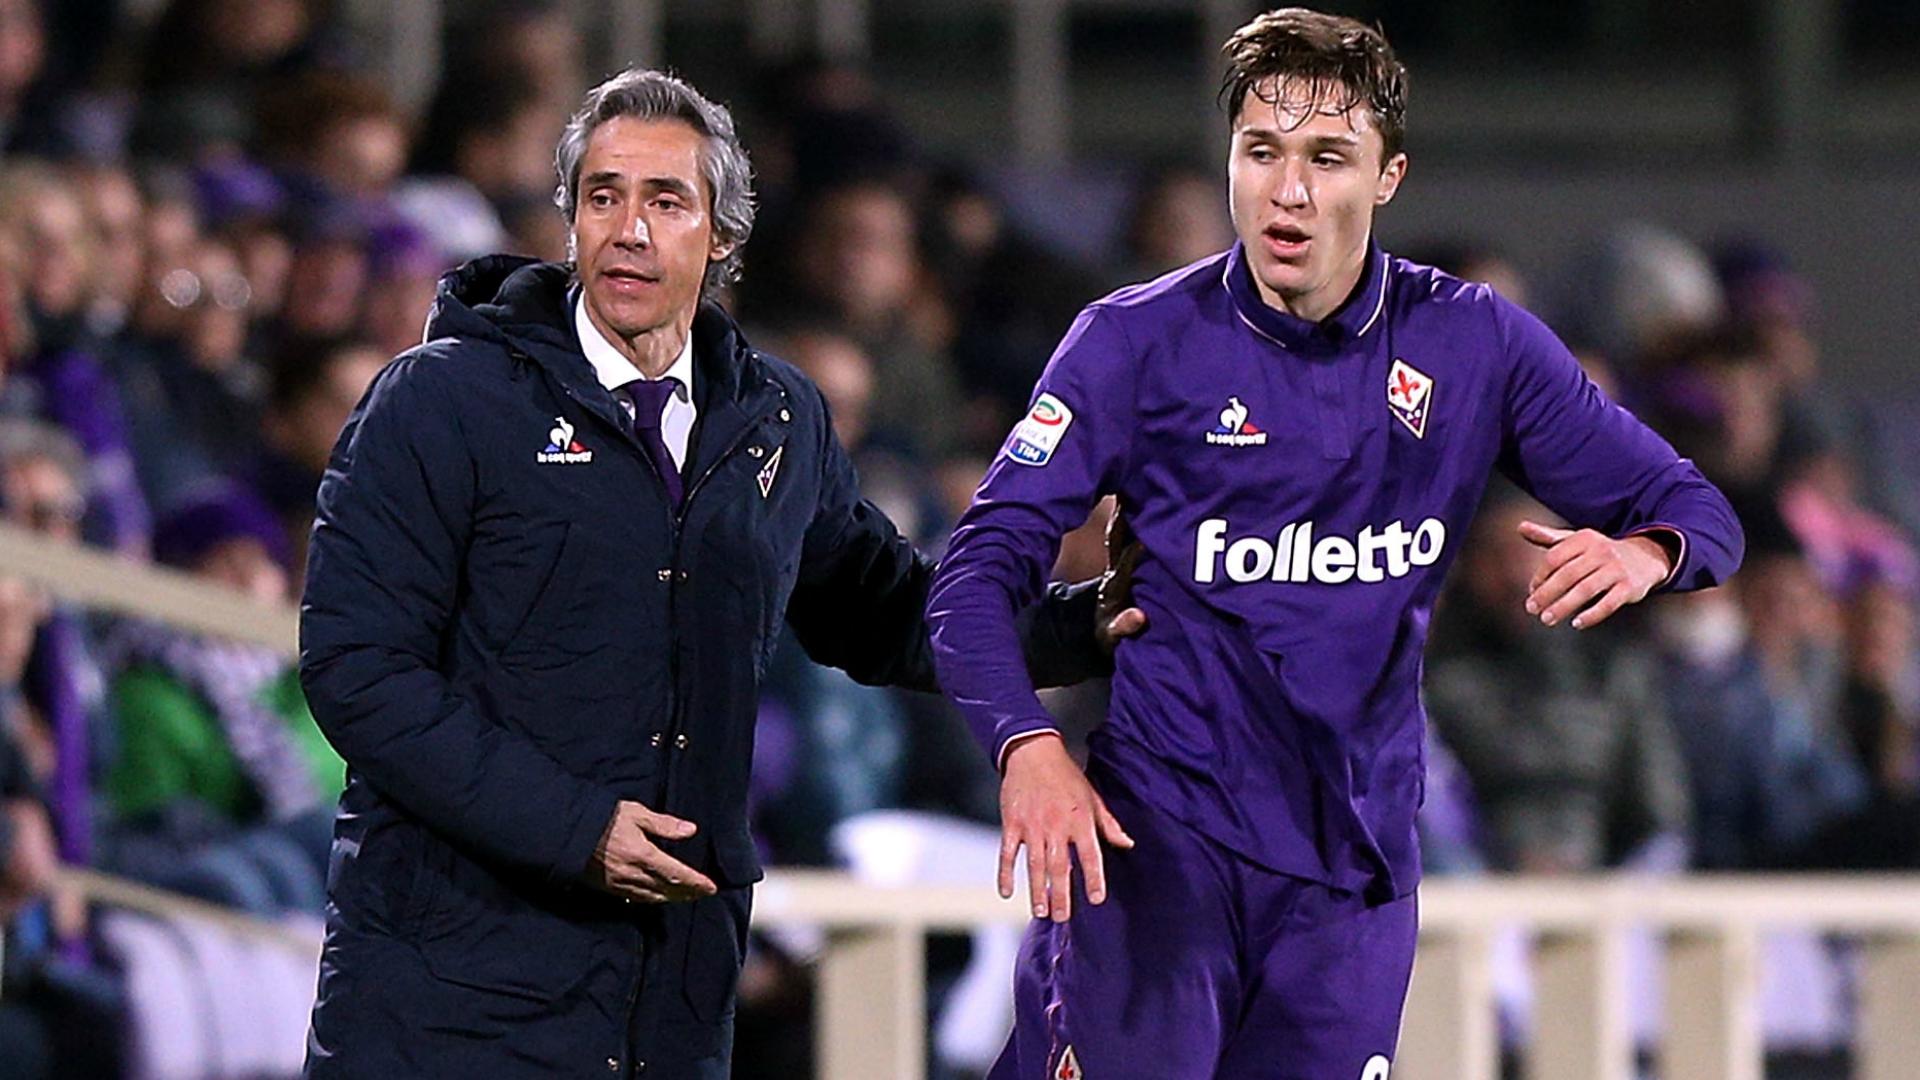 Paulo Sousa Federico Chiesa Fiorentina Torino Serie A 27022017